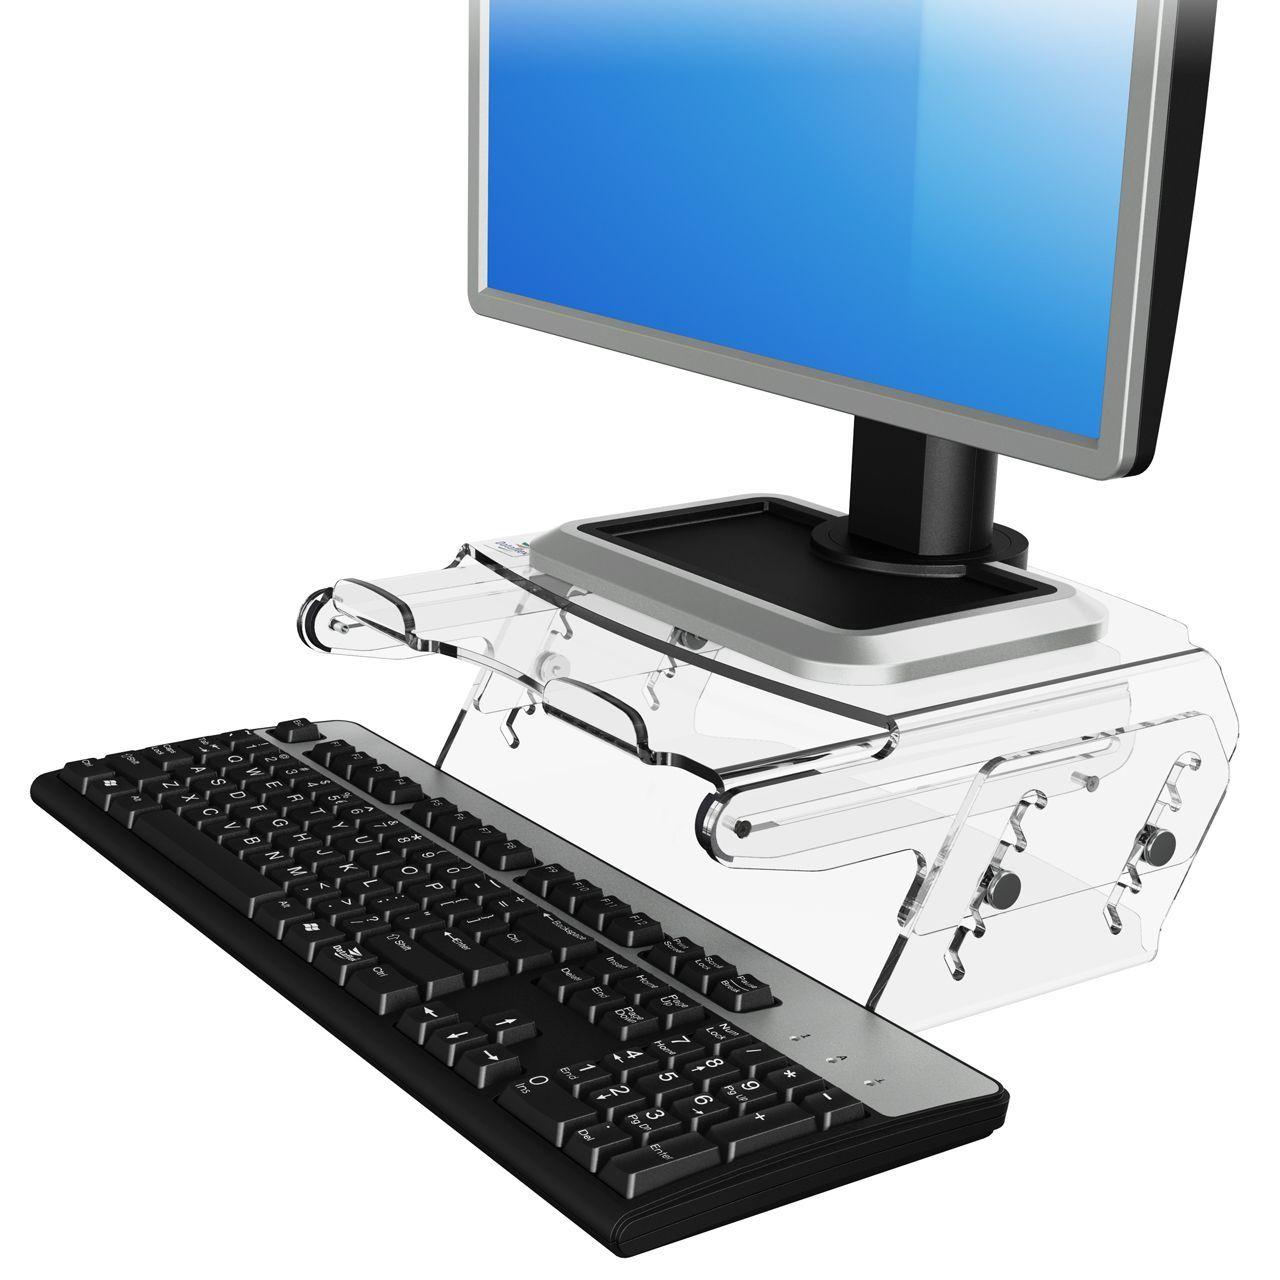 Ergoline 250 monitorsteun